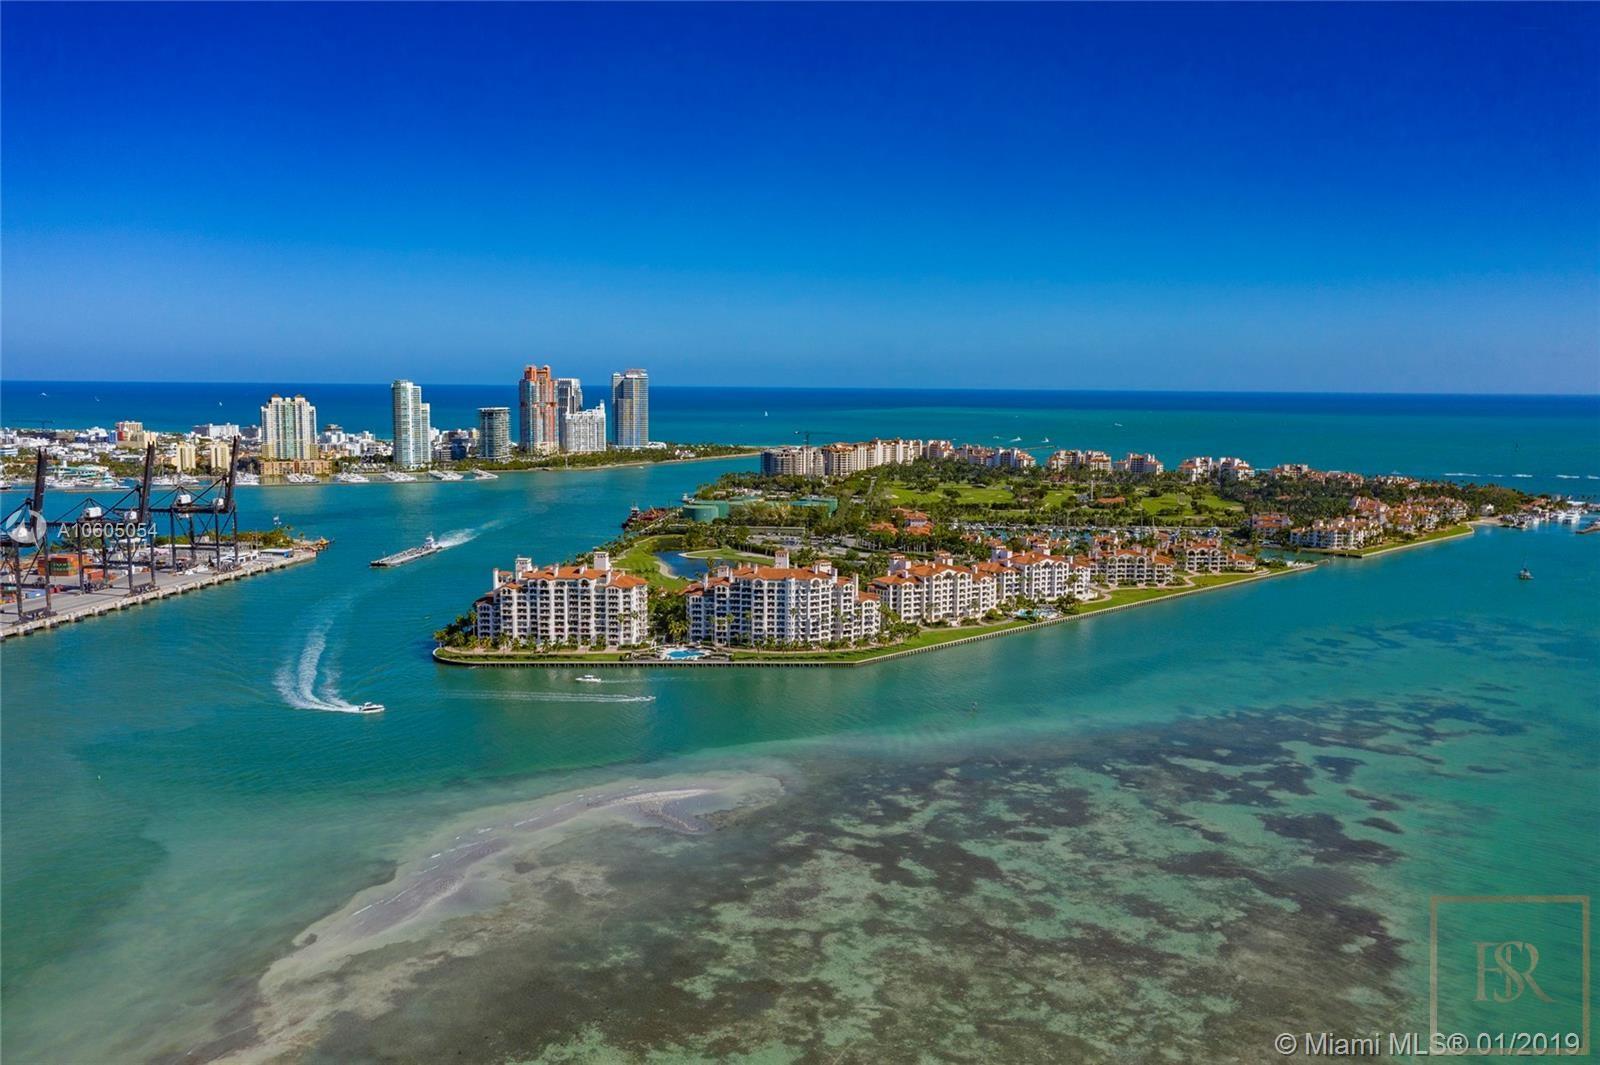 Apartment FISHER ISLAND 5203 Fisher Island Drive - Miami, USA for sale For Super Rich